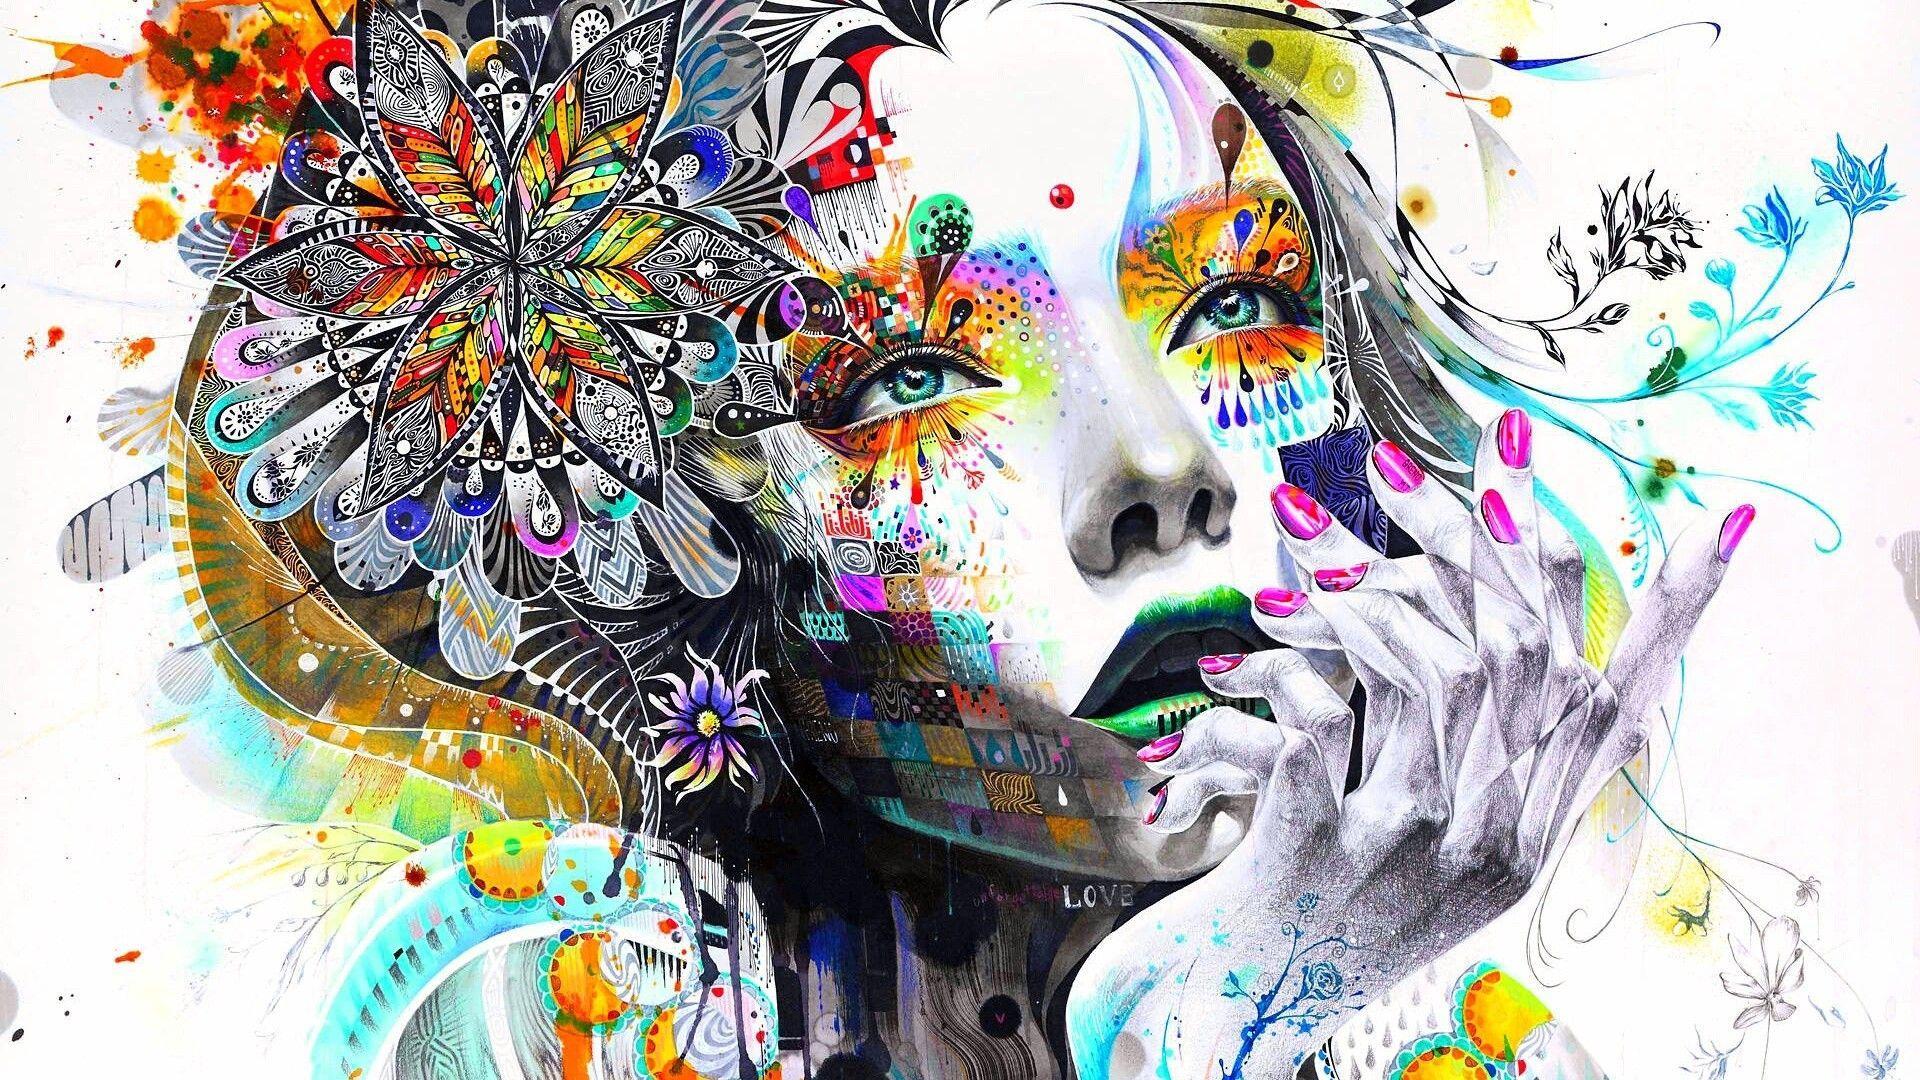 Art Desktop Wallpapers Top Free Art Desktop Backgrounds Wallpaperaccess